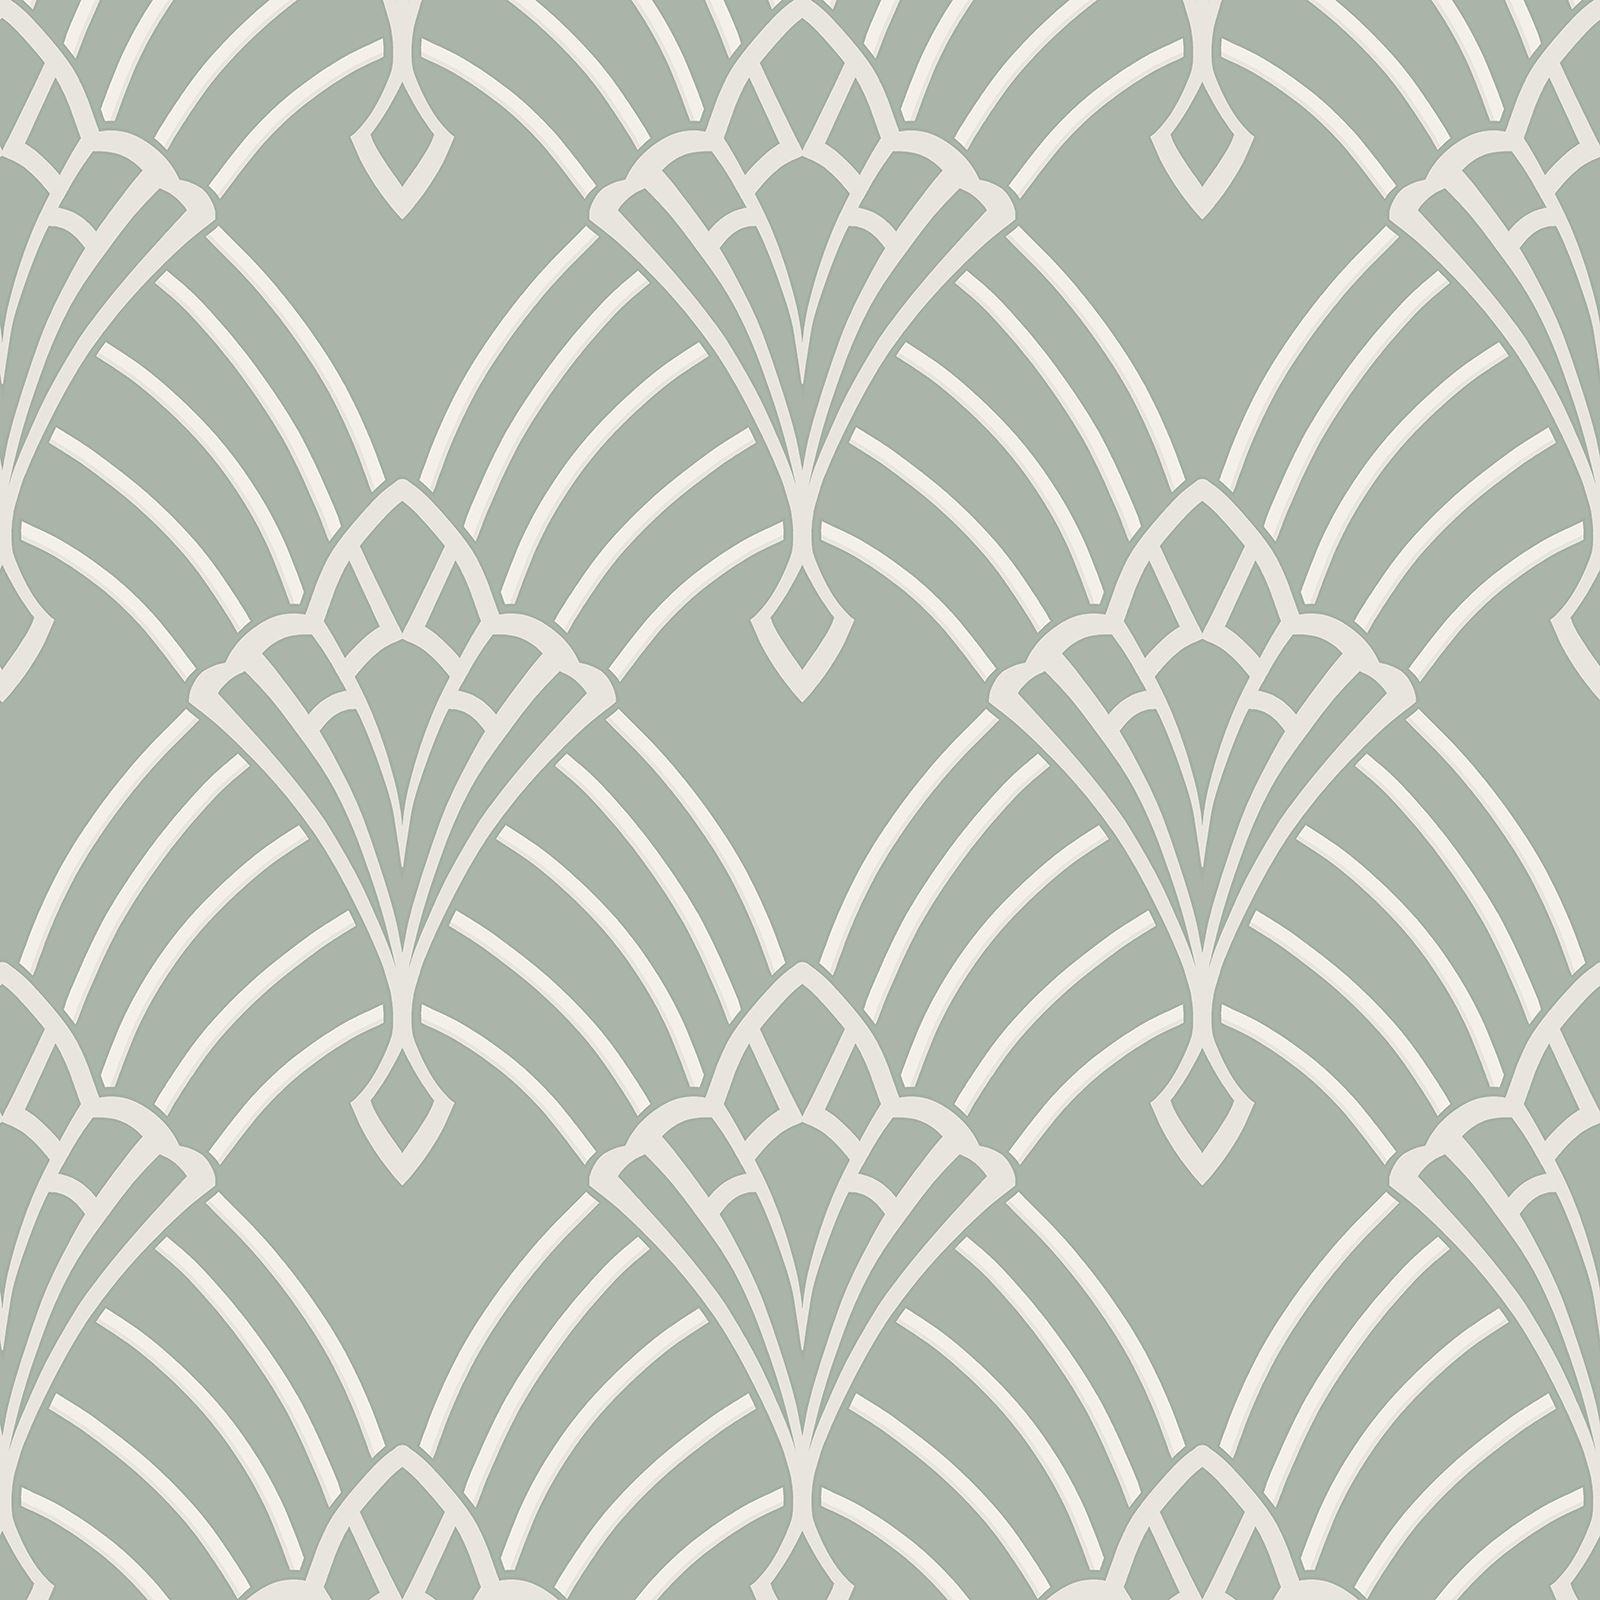 Rasch Astoria Art Deco Geometric Wallpaper Glitter Silver